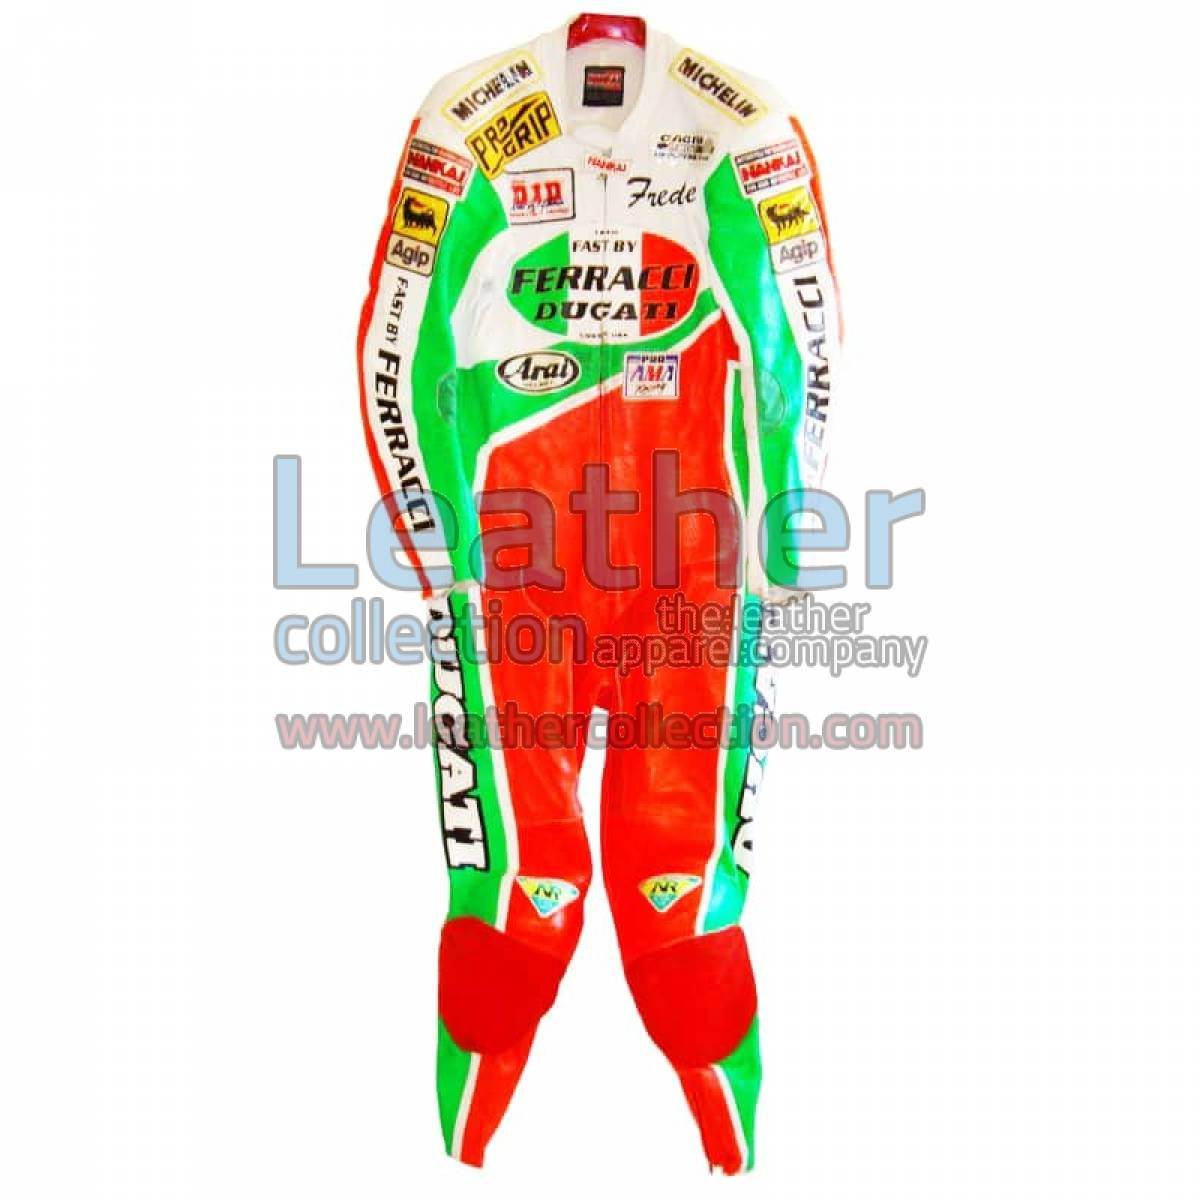 Freddie Spencer Ducati Corse AMA Leathers